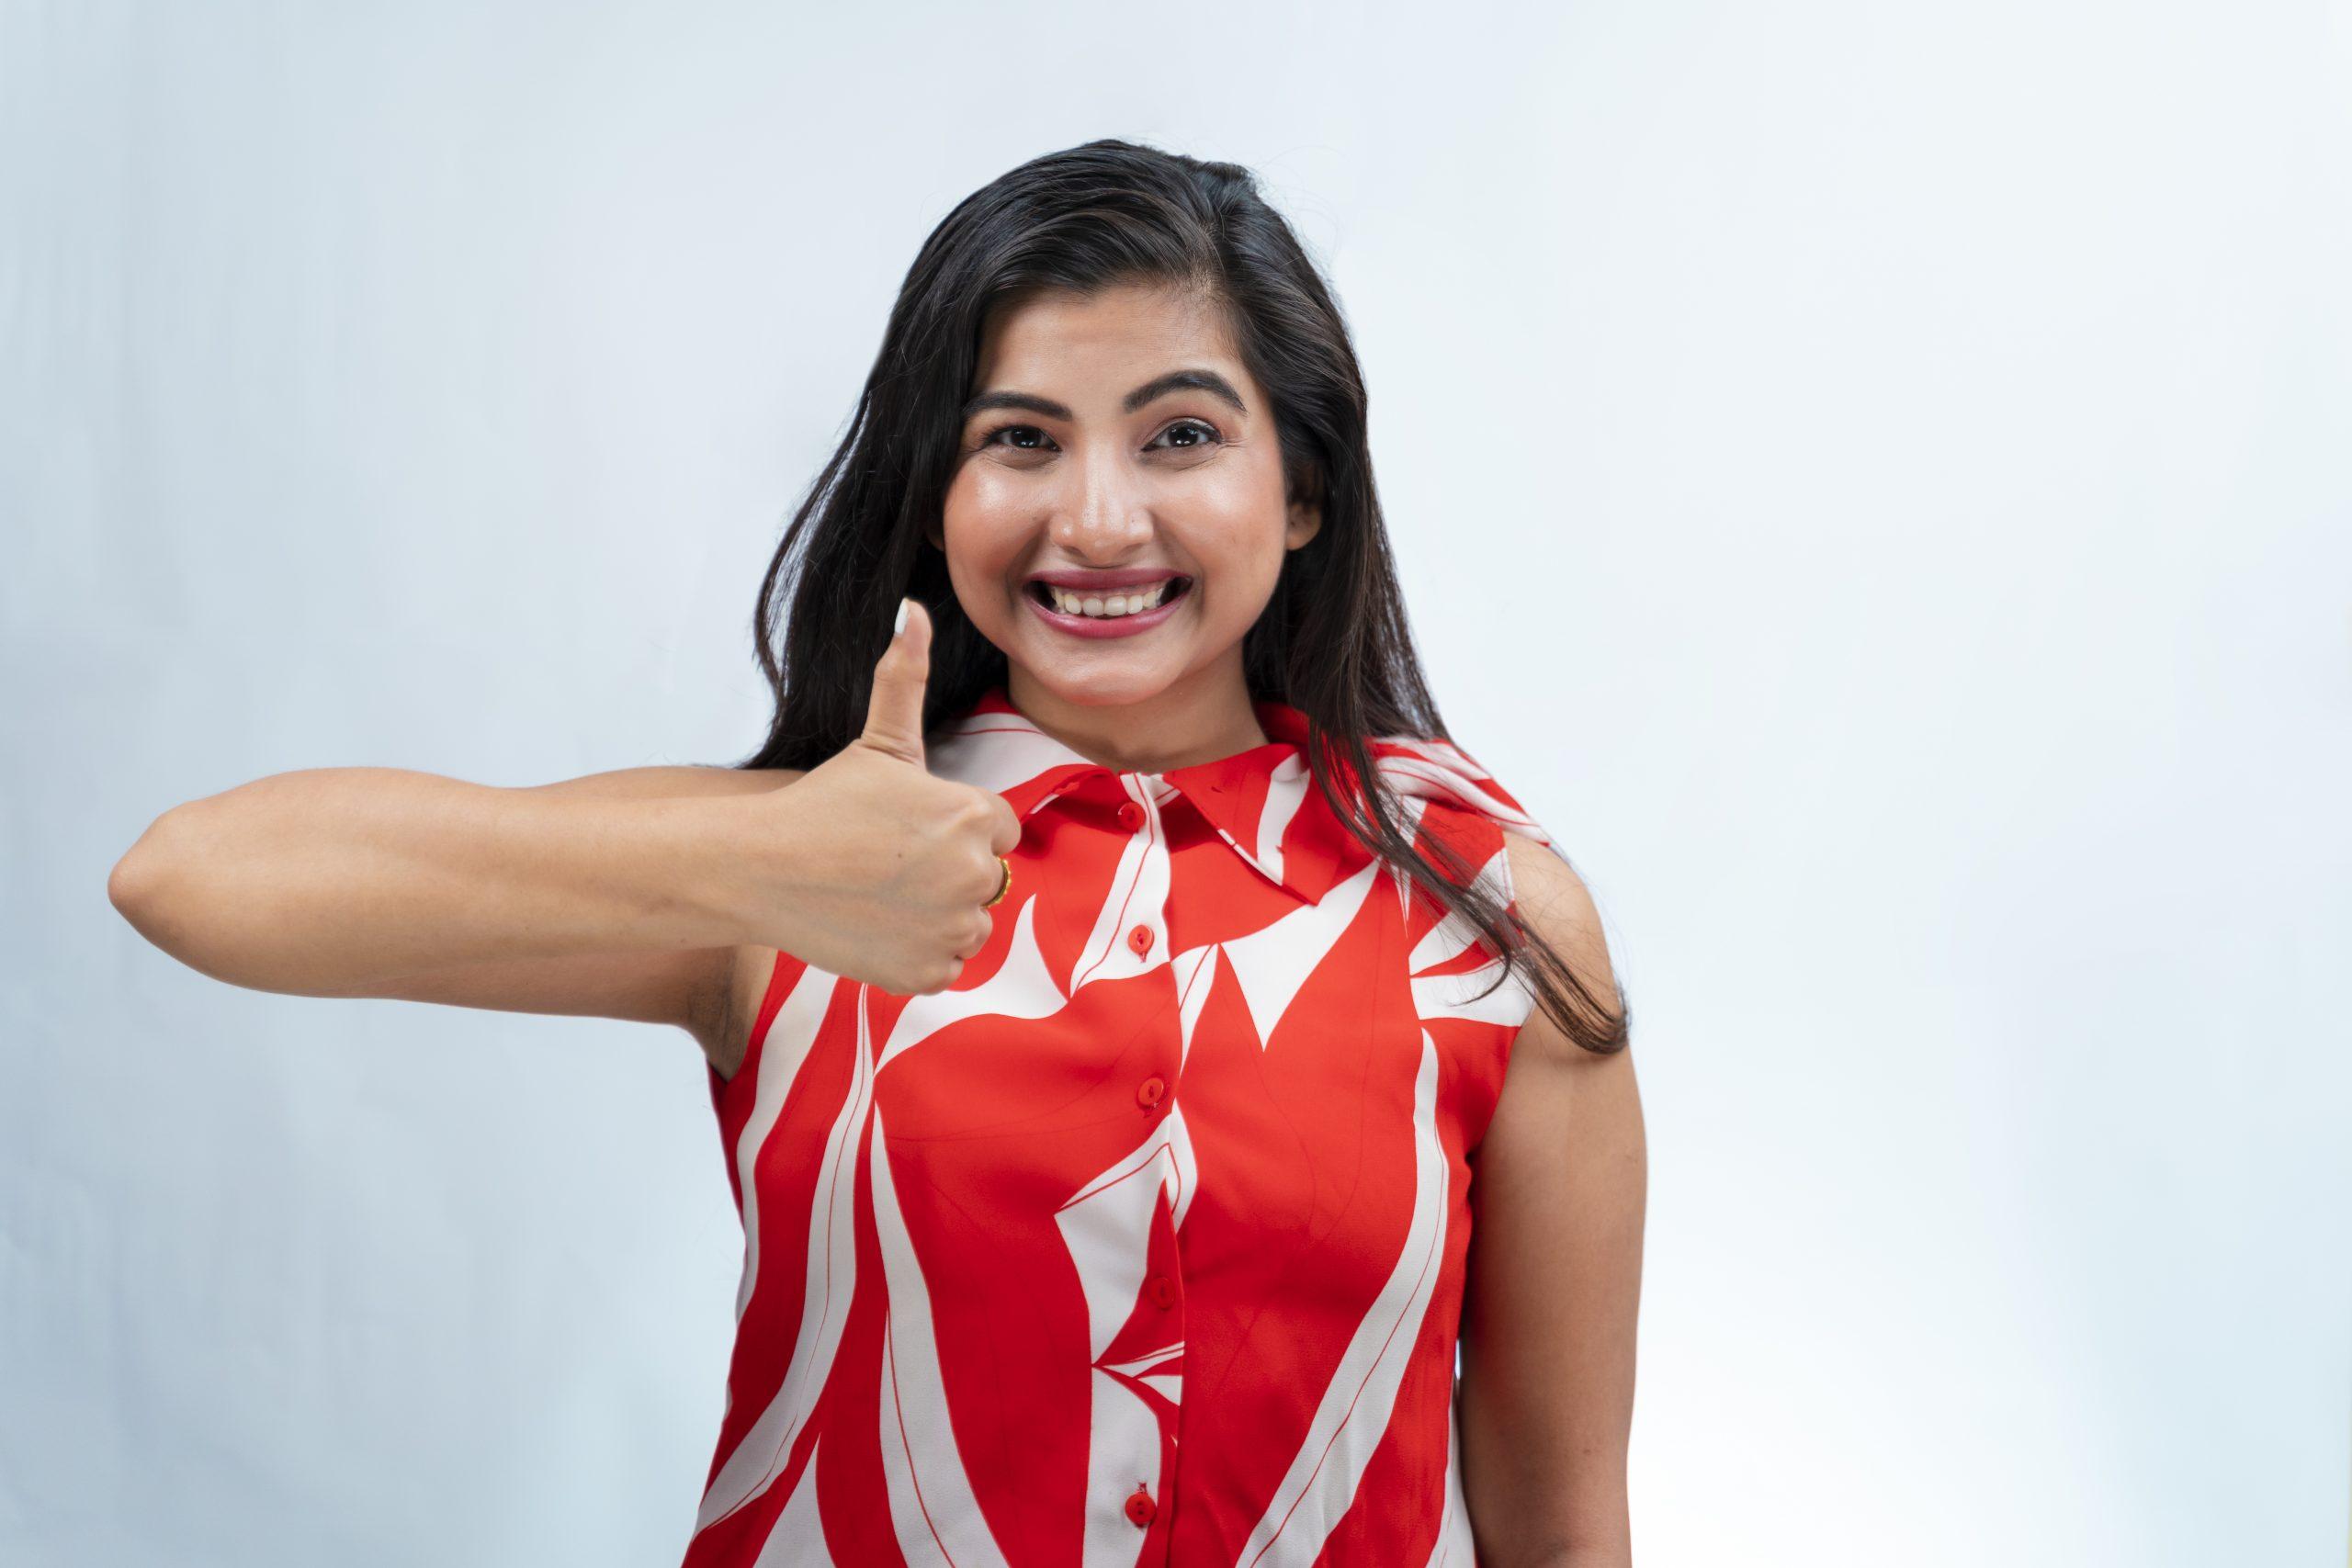 Indian girl doing thumbs up